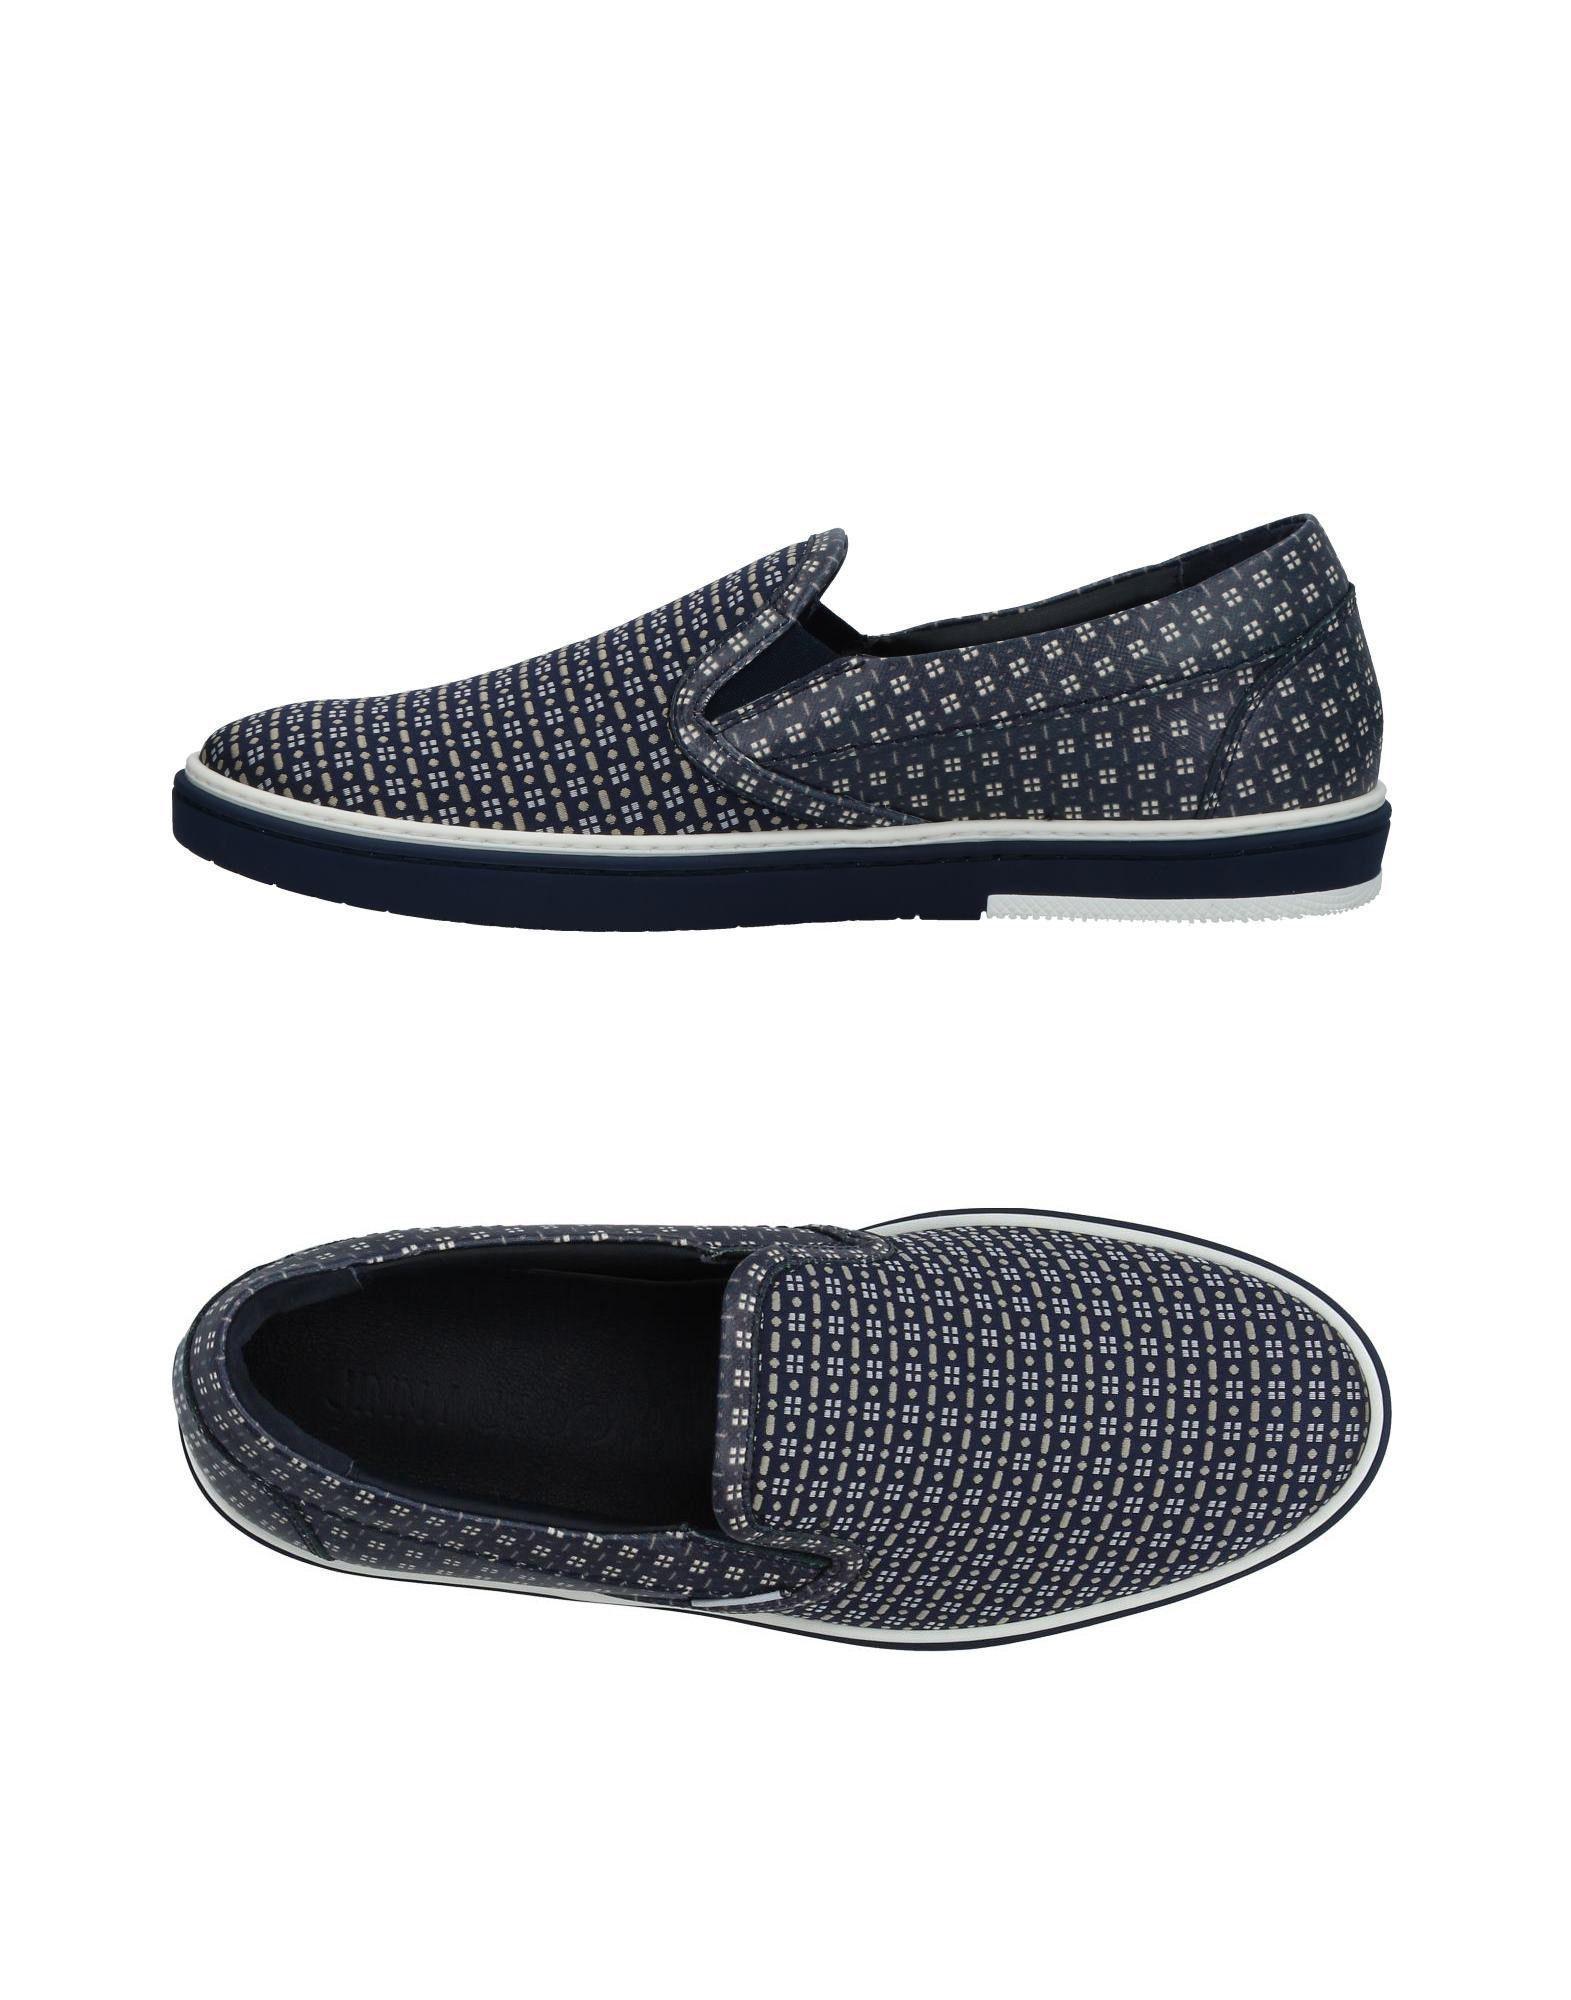 Discount 234175 Nike Air Max Men White Black Shoes